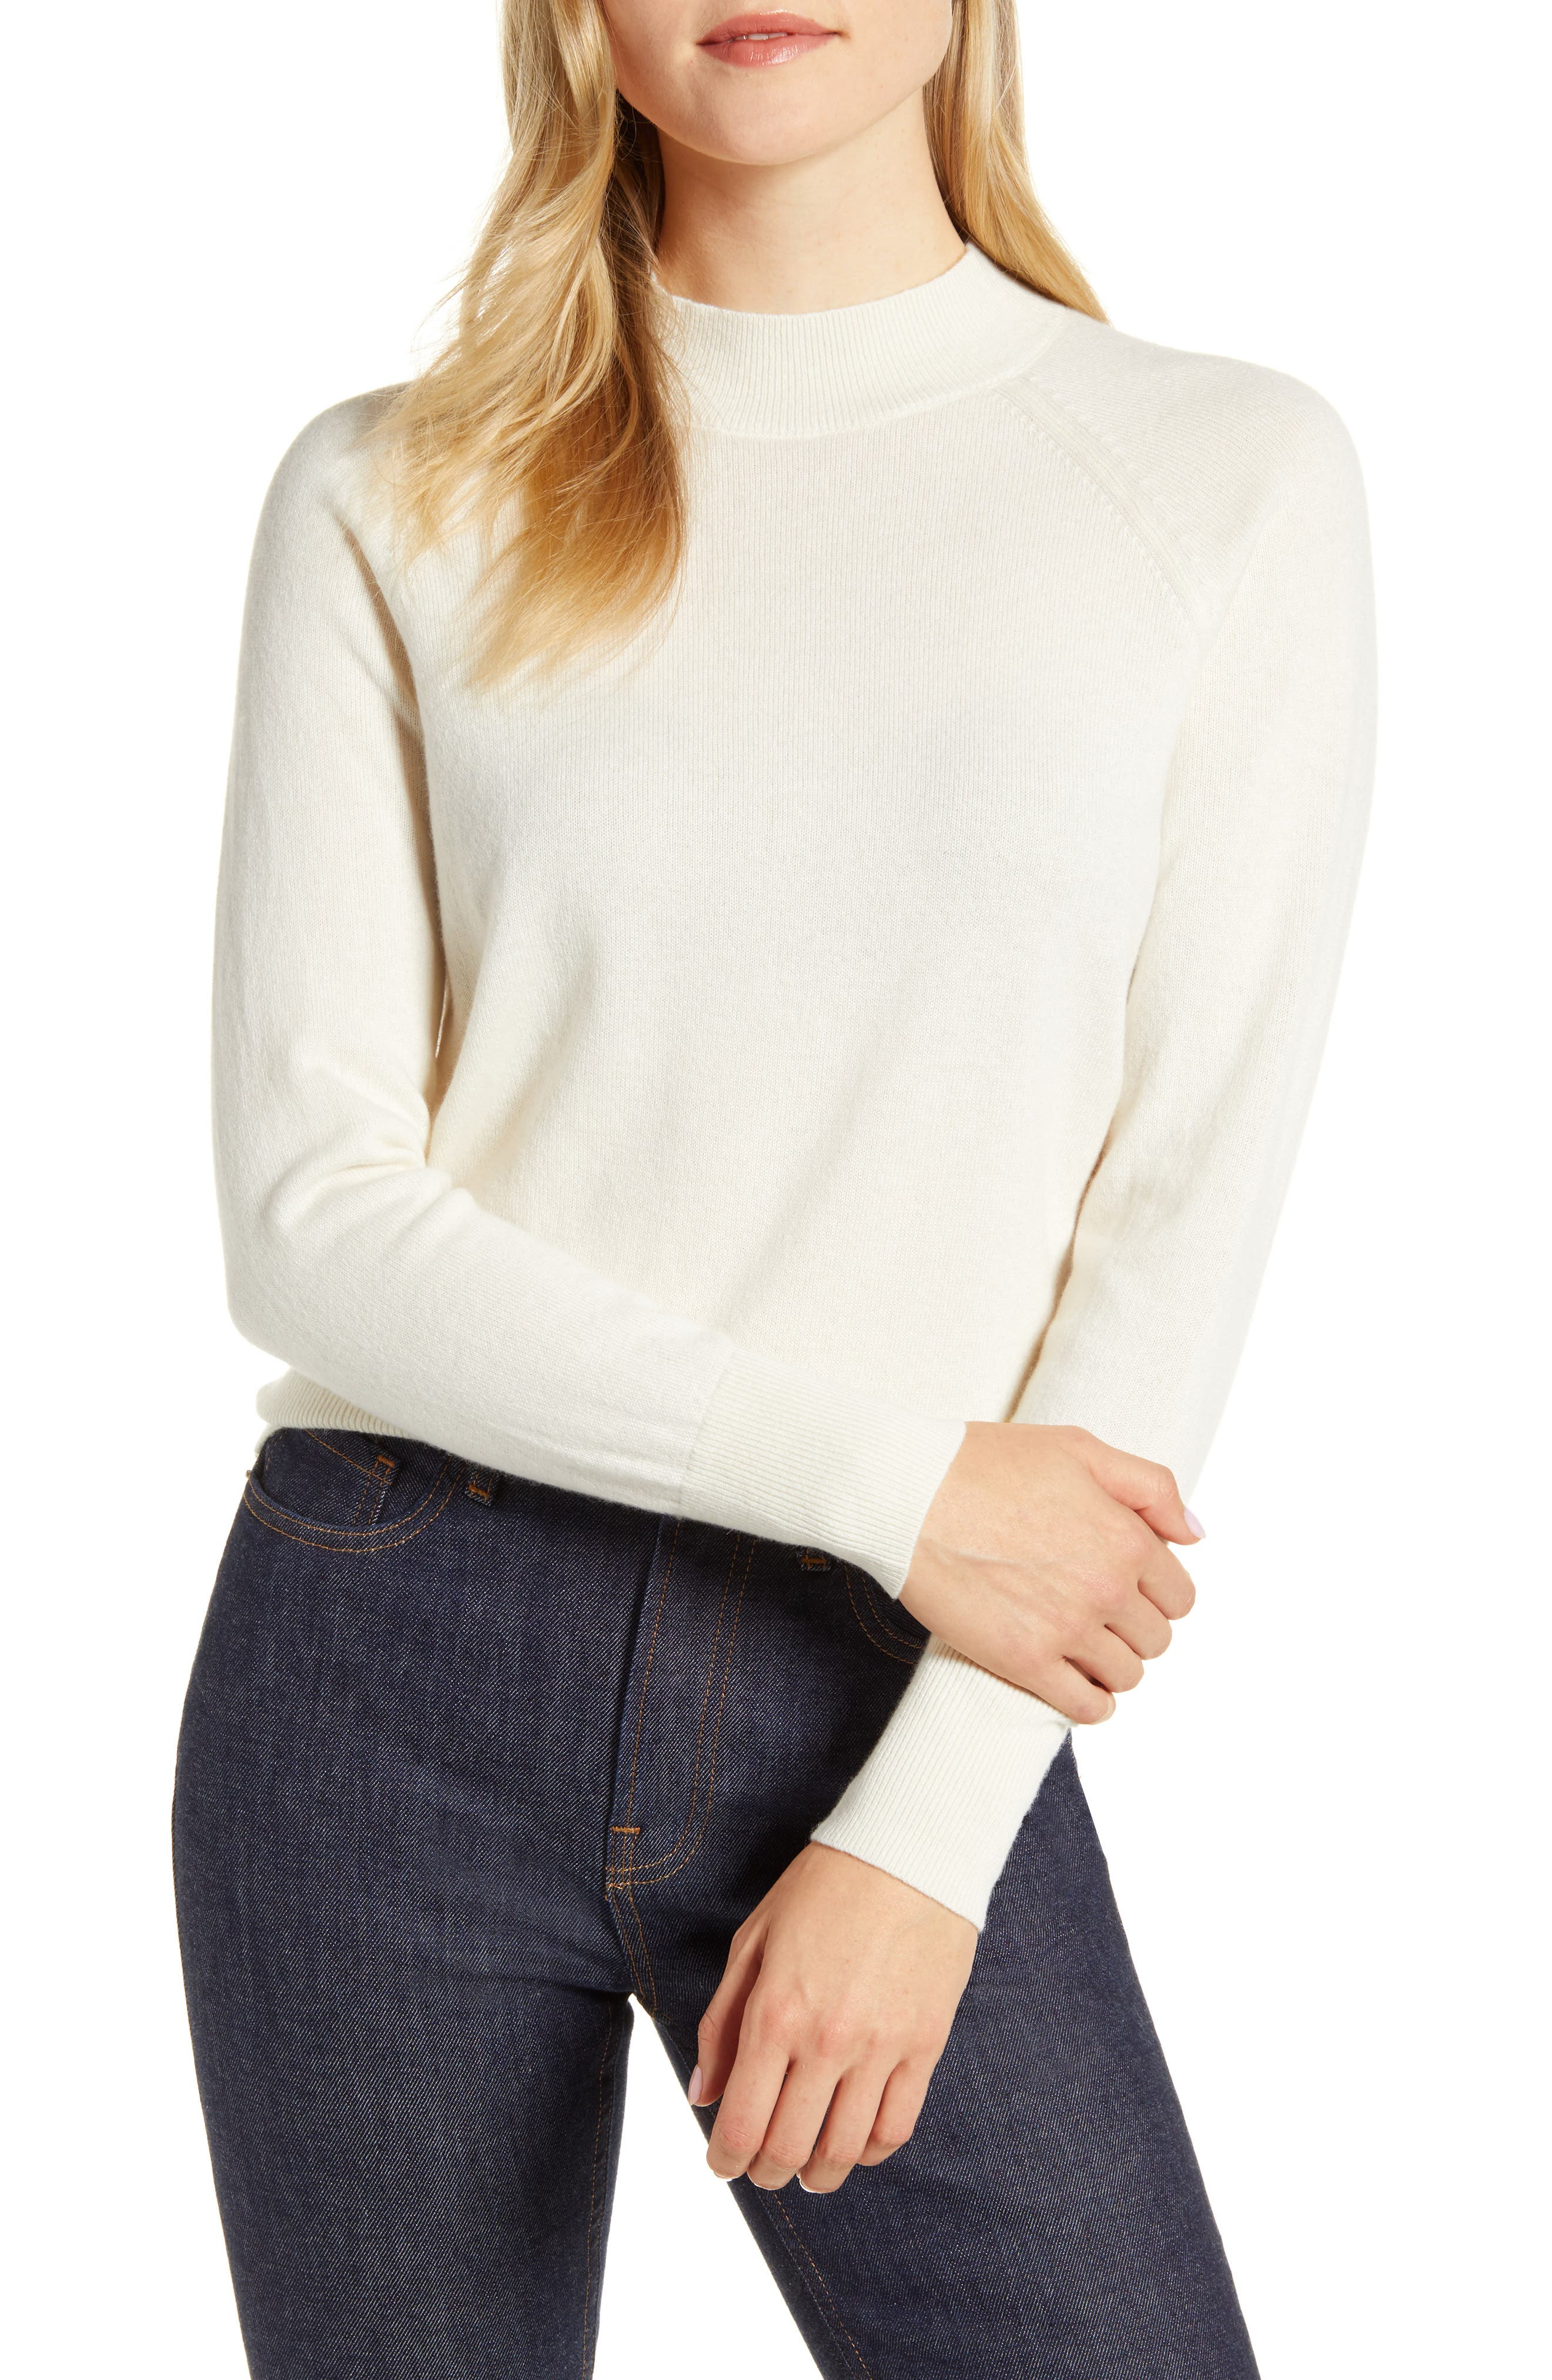 Image of EVERLANE The Cashmere Raglan Mock Neck Sweater